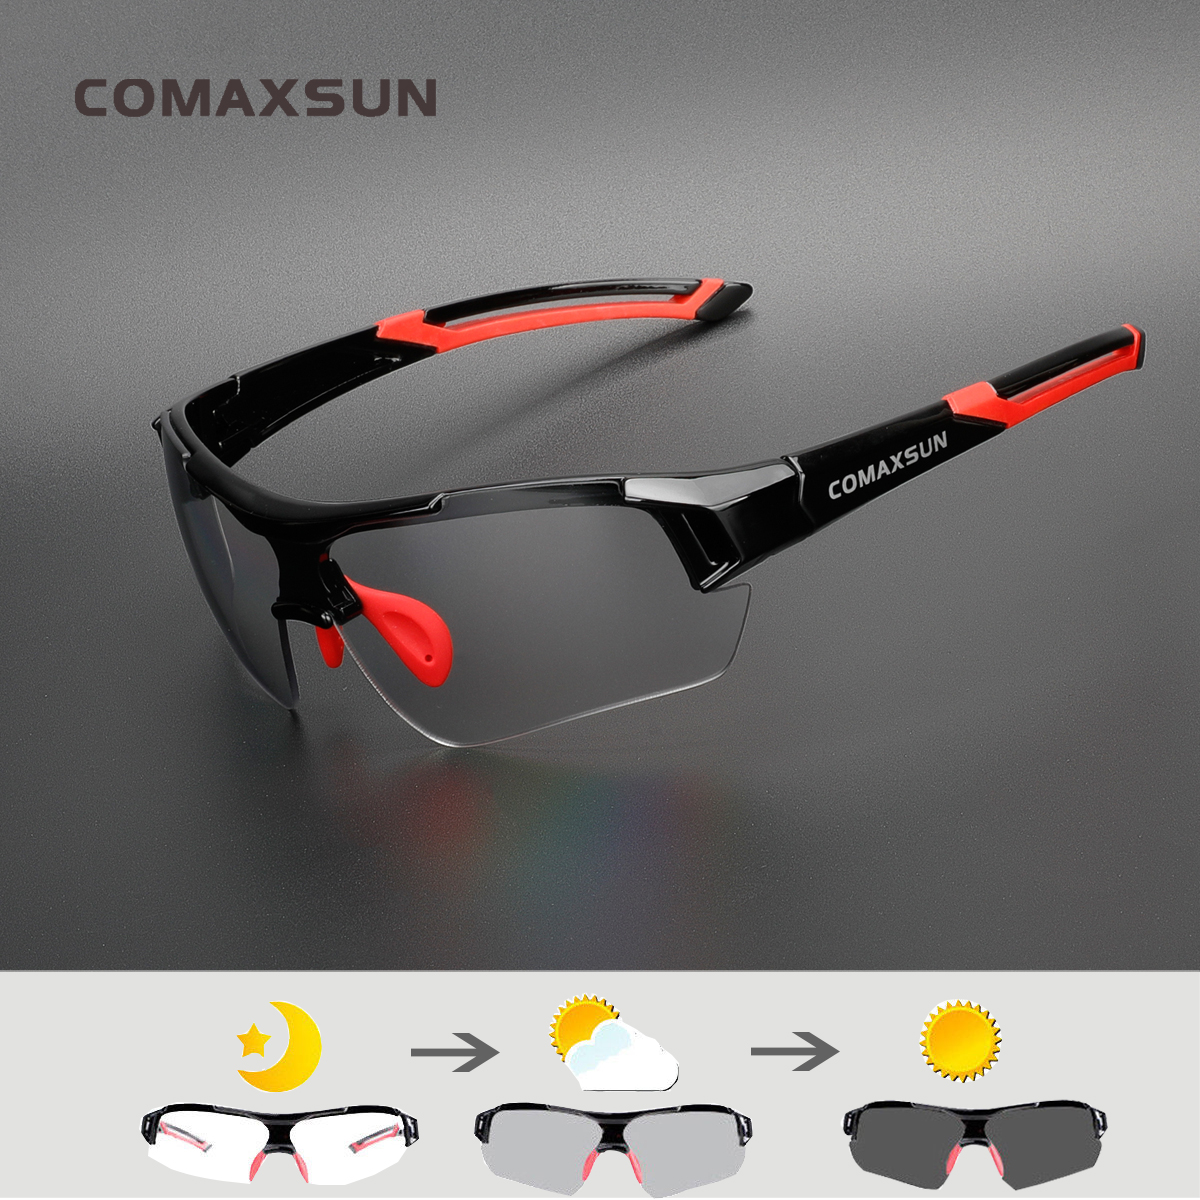 COMAXSUN Photochrome Radfahren Gläser Verfärbung Gläser MTB Rennrad Sport Sonnenbrille Fahrrad Brillen Fahrrad Brille 2 Stil